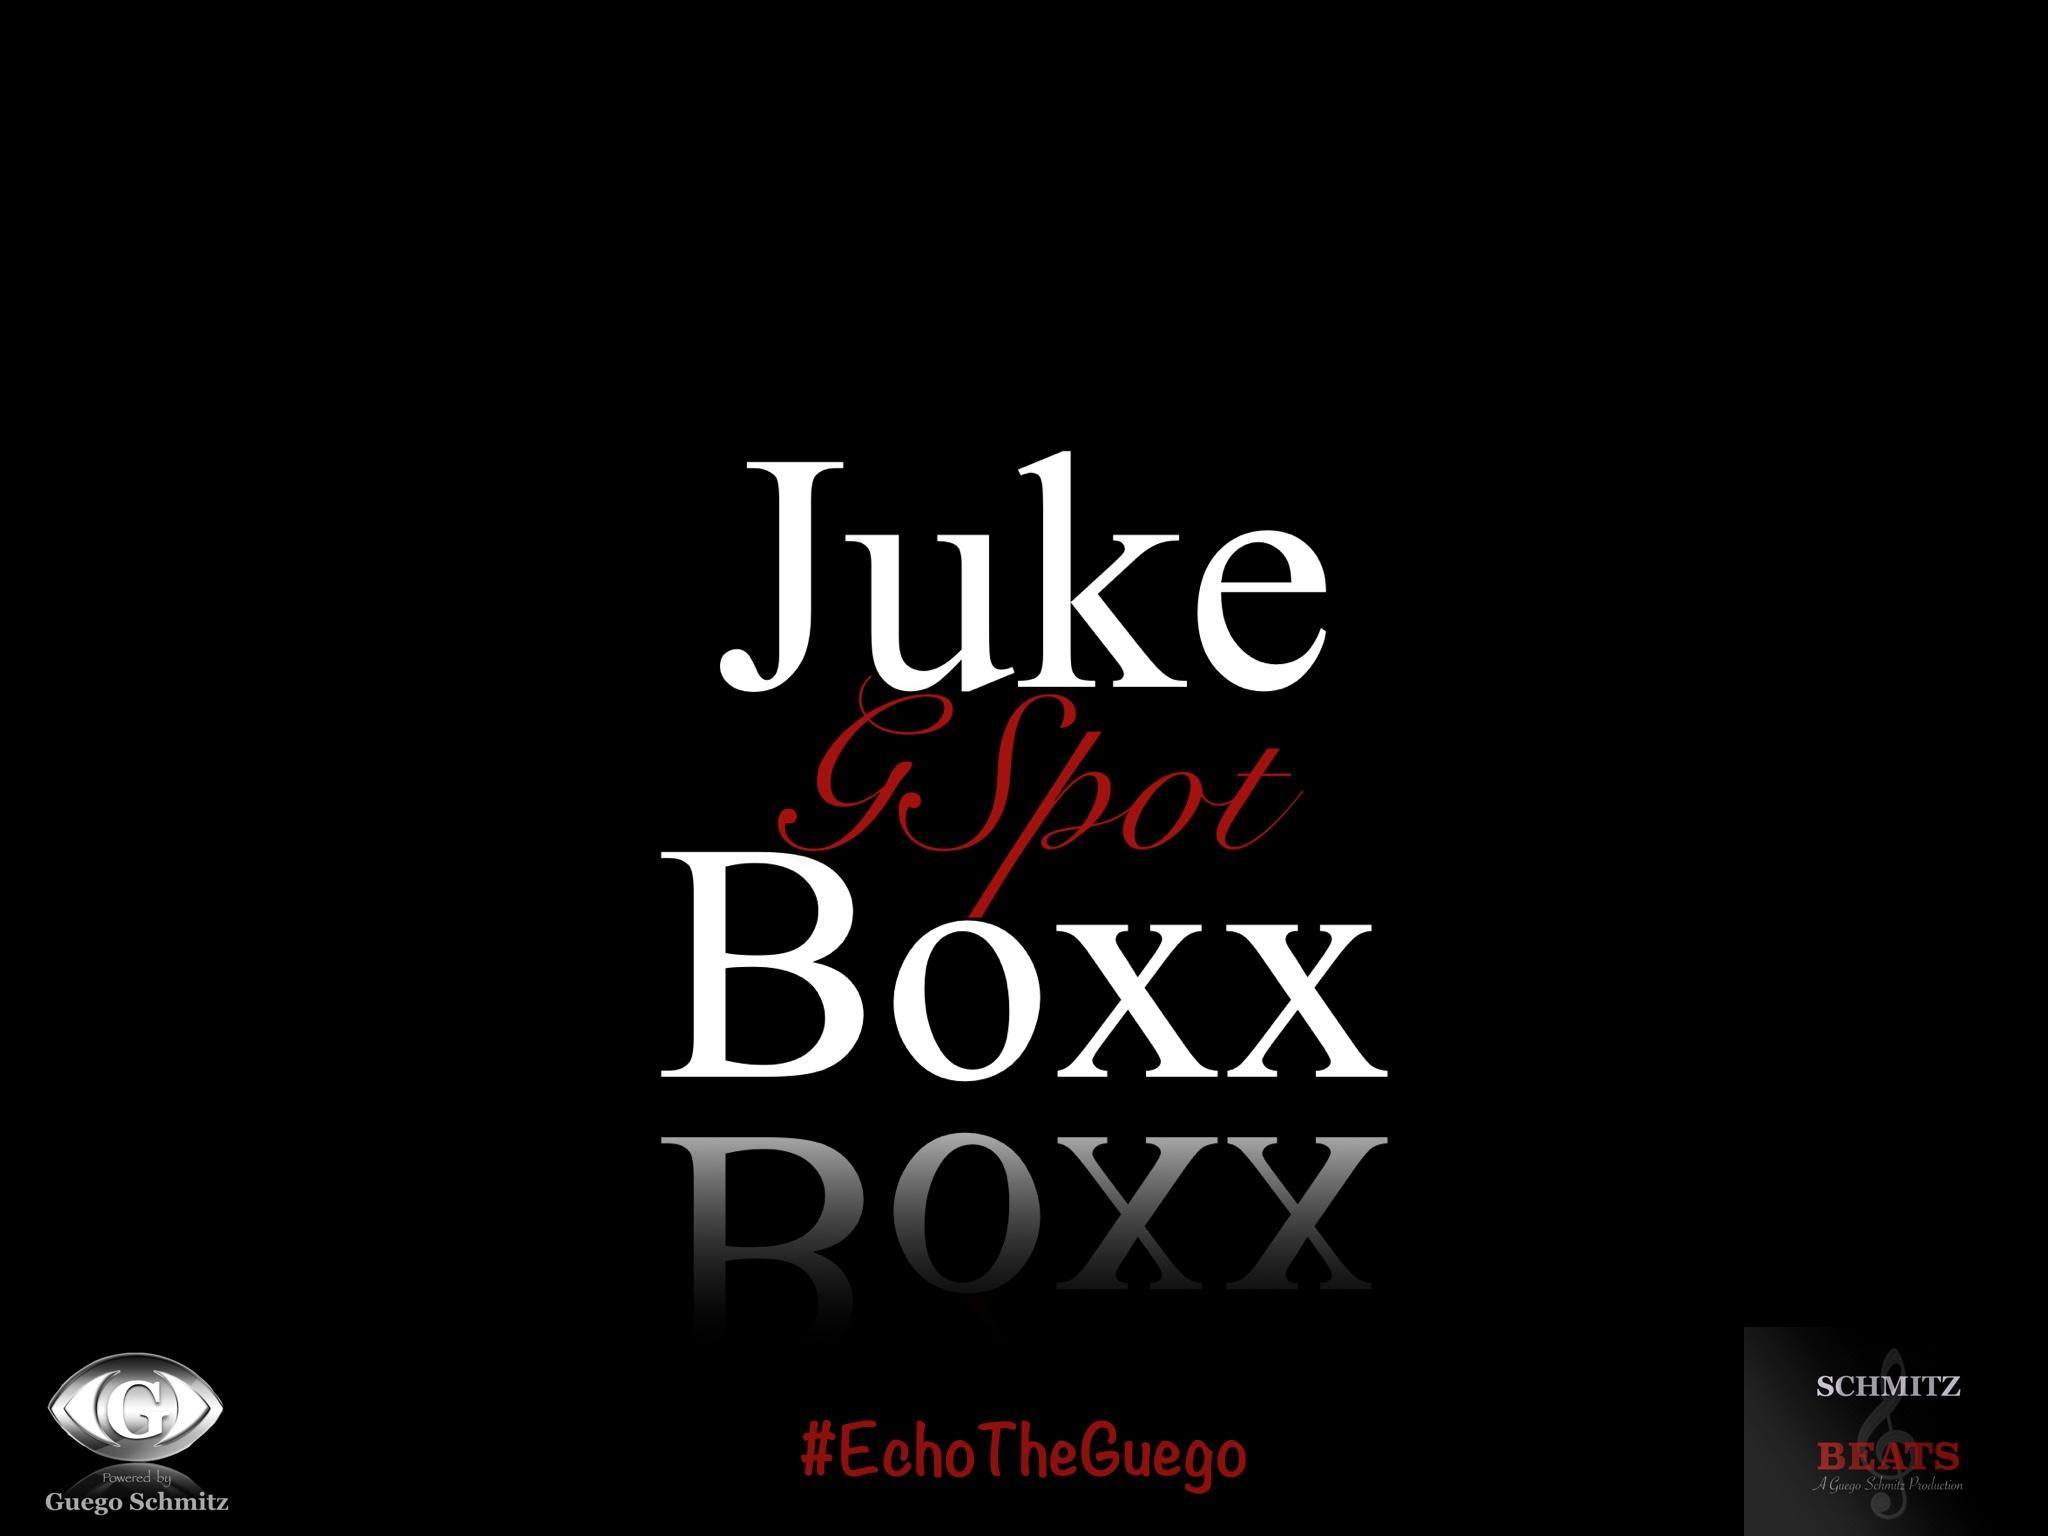 GSpot Juke Boxx